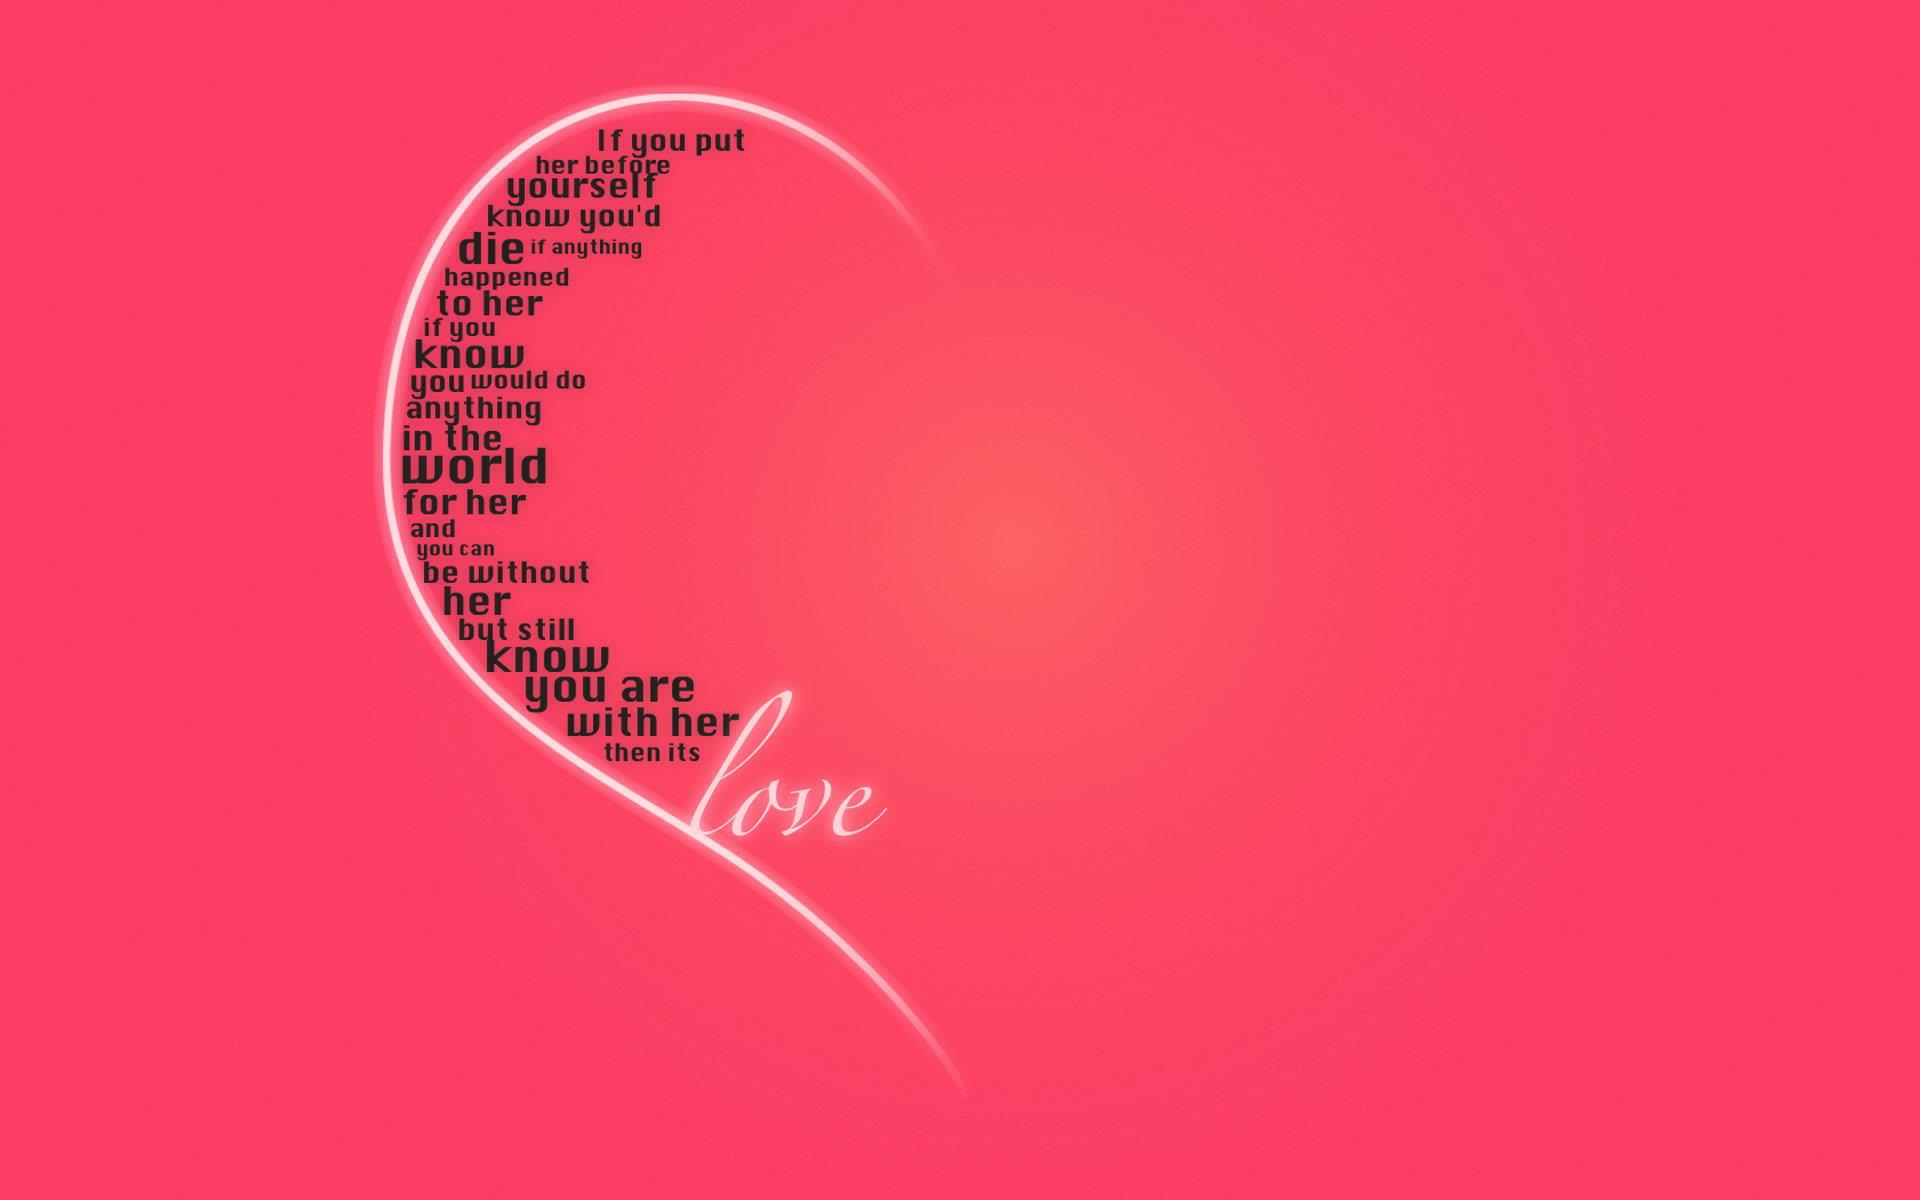 Artistic Love HD Wallpaper